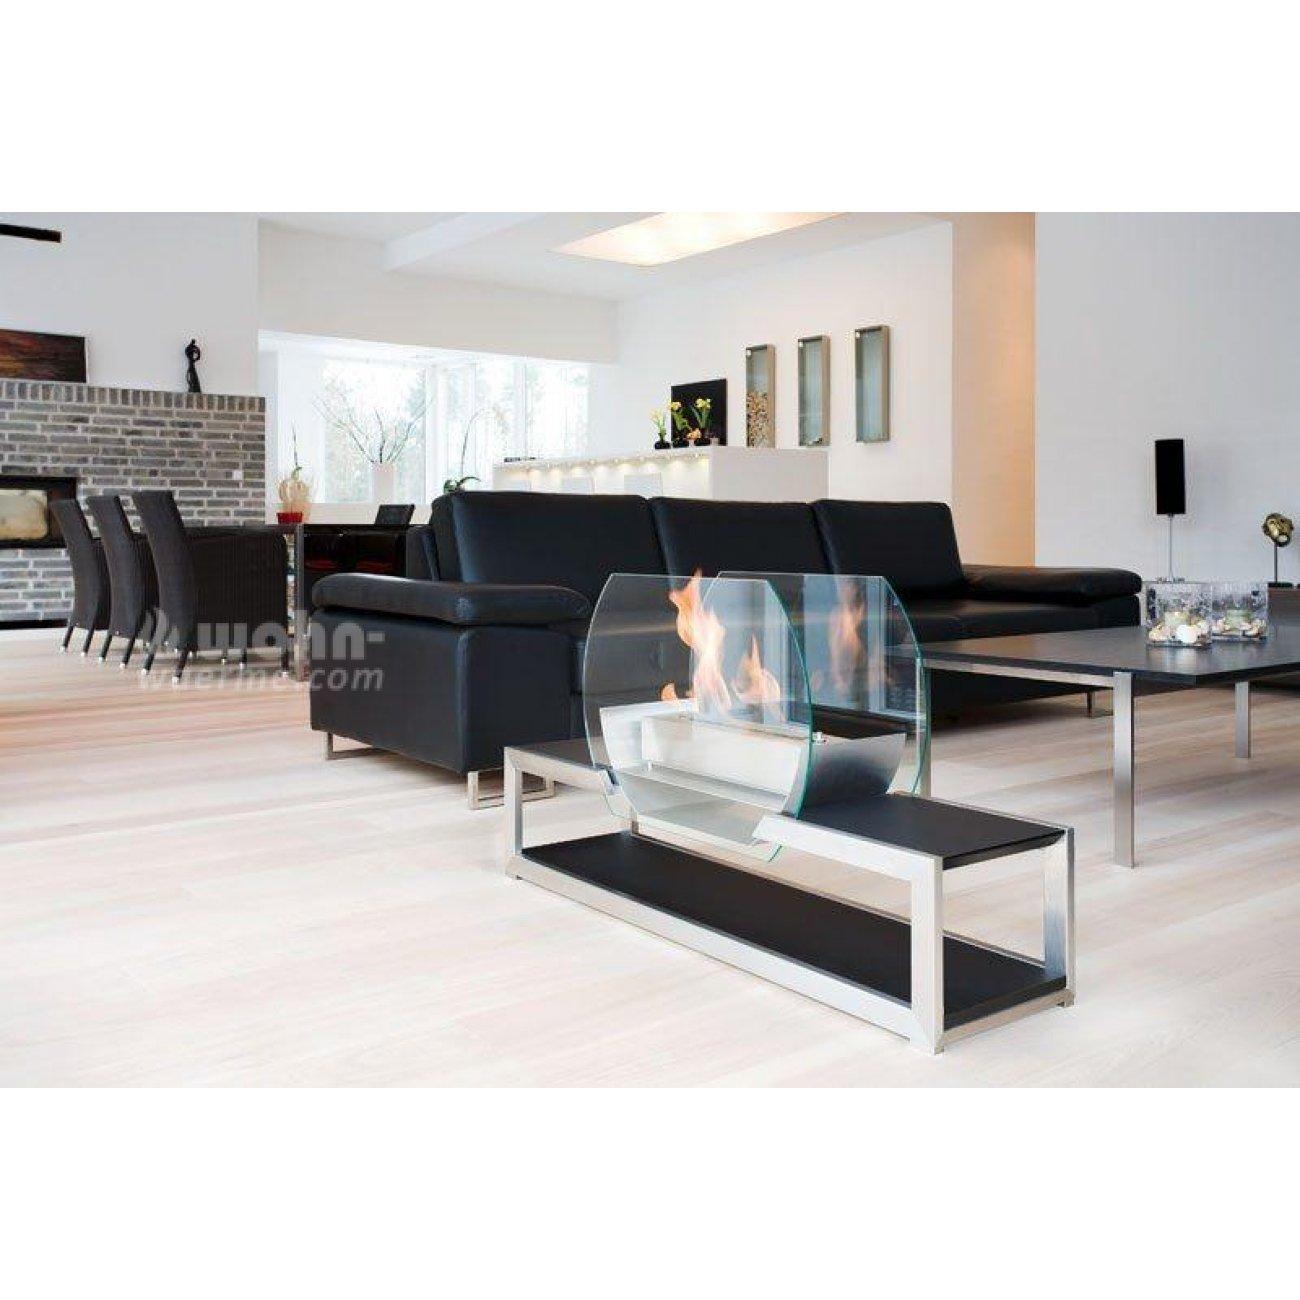 stand ethanolkamin decoflame chicago. Black Bedroom Furniture Sets. Home Design Ideas